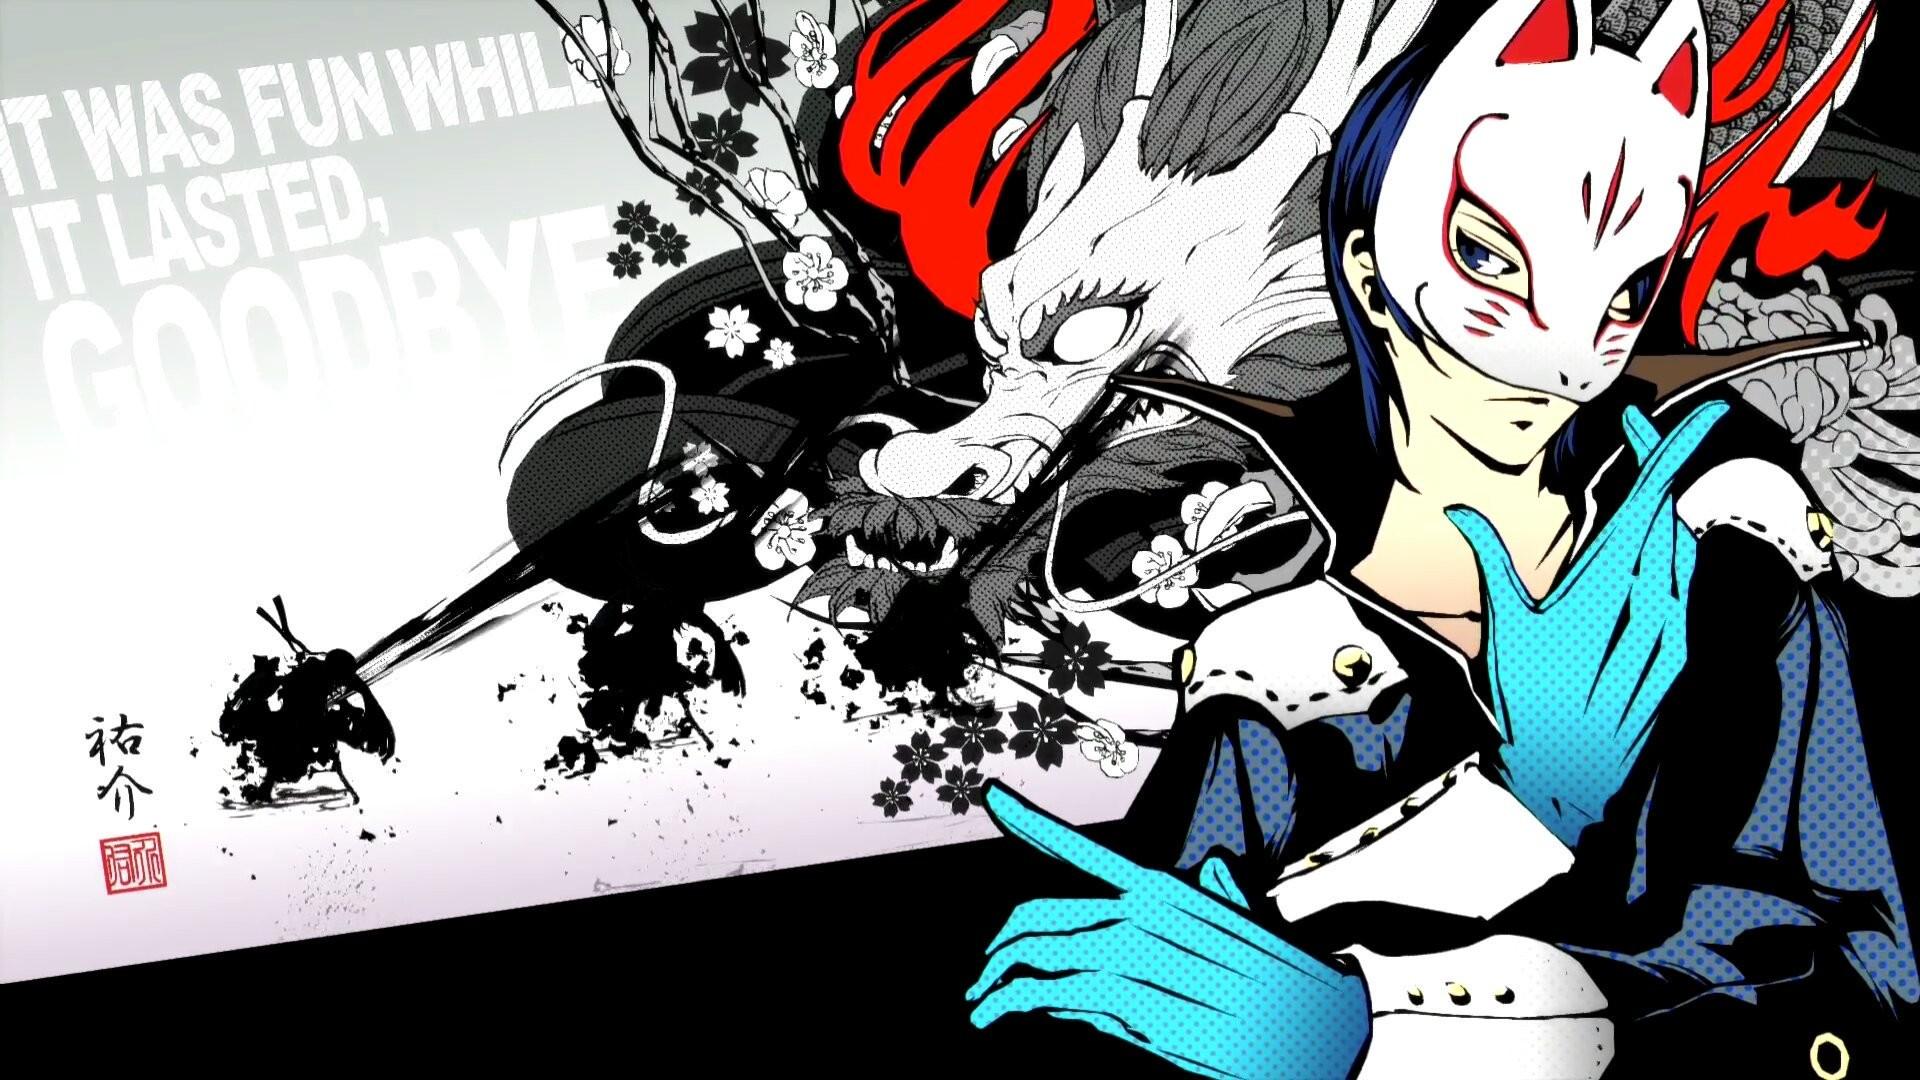 Persona 5 Wallpaper HD (81+ images)